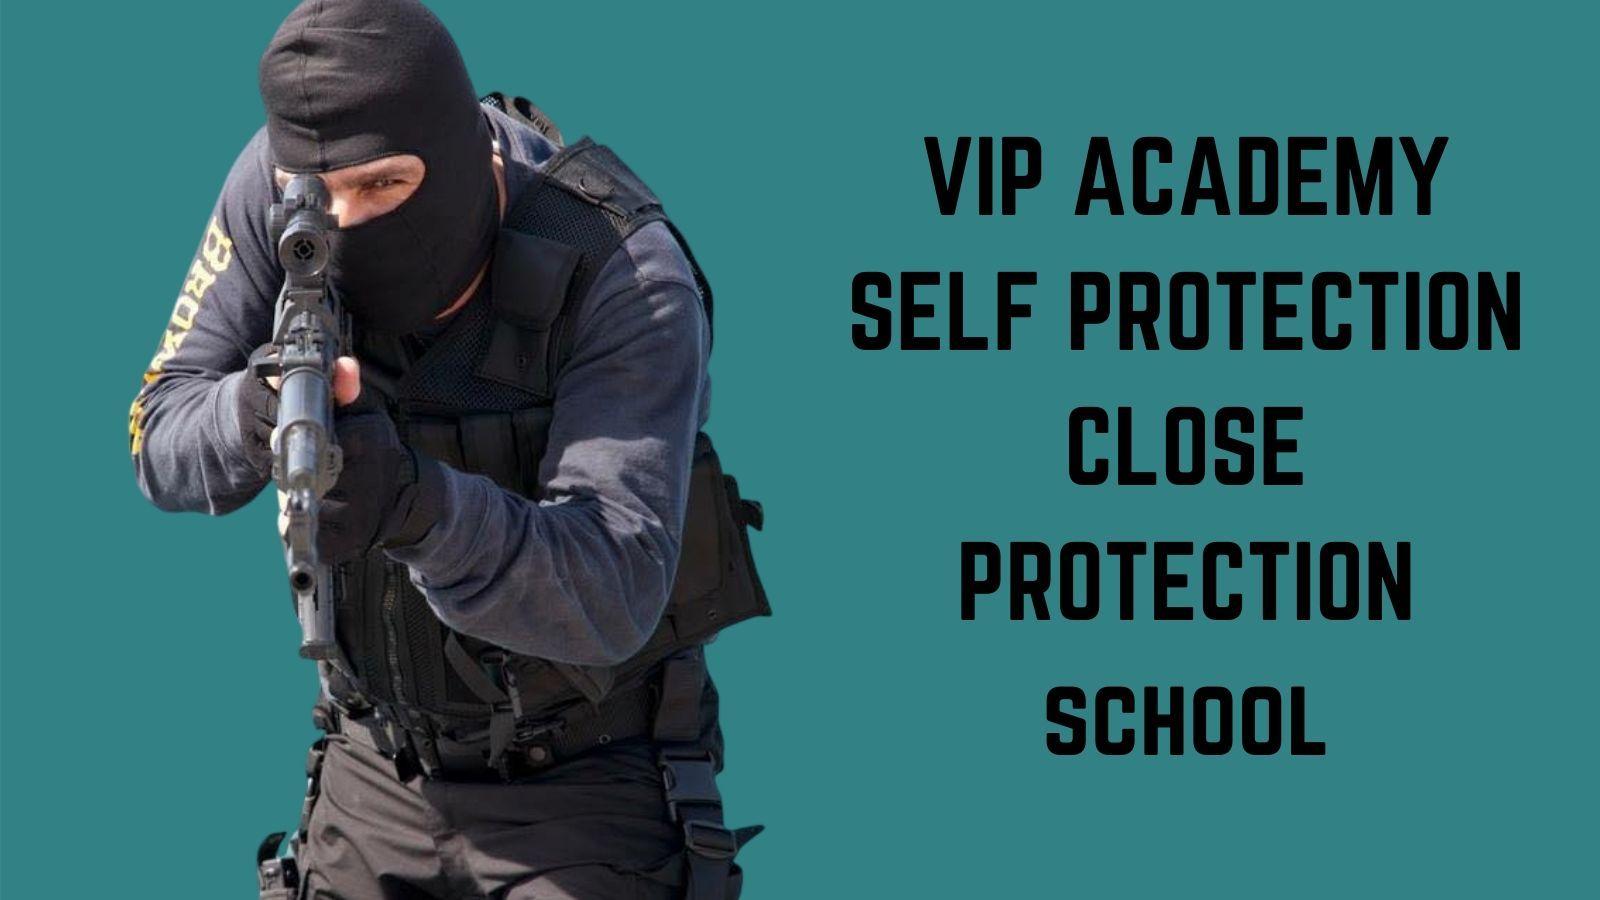 vip academy